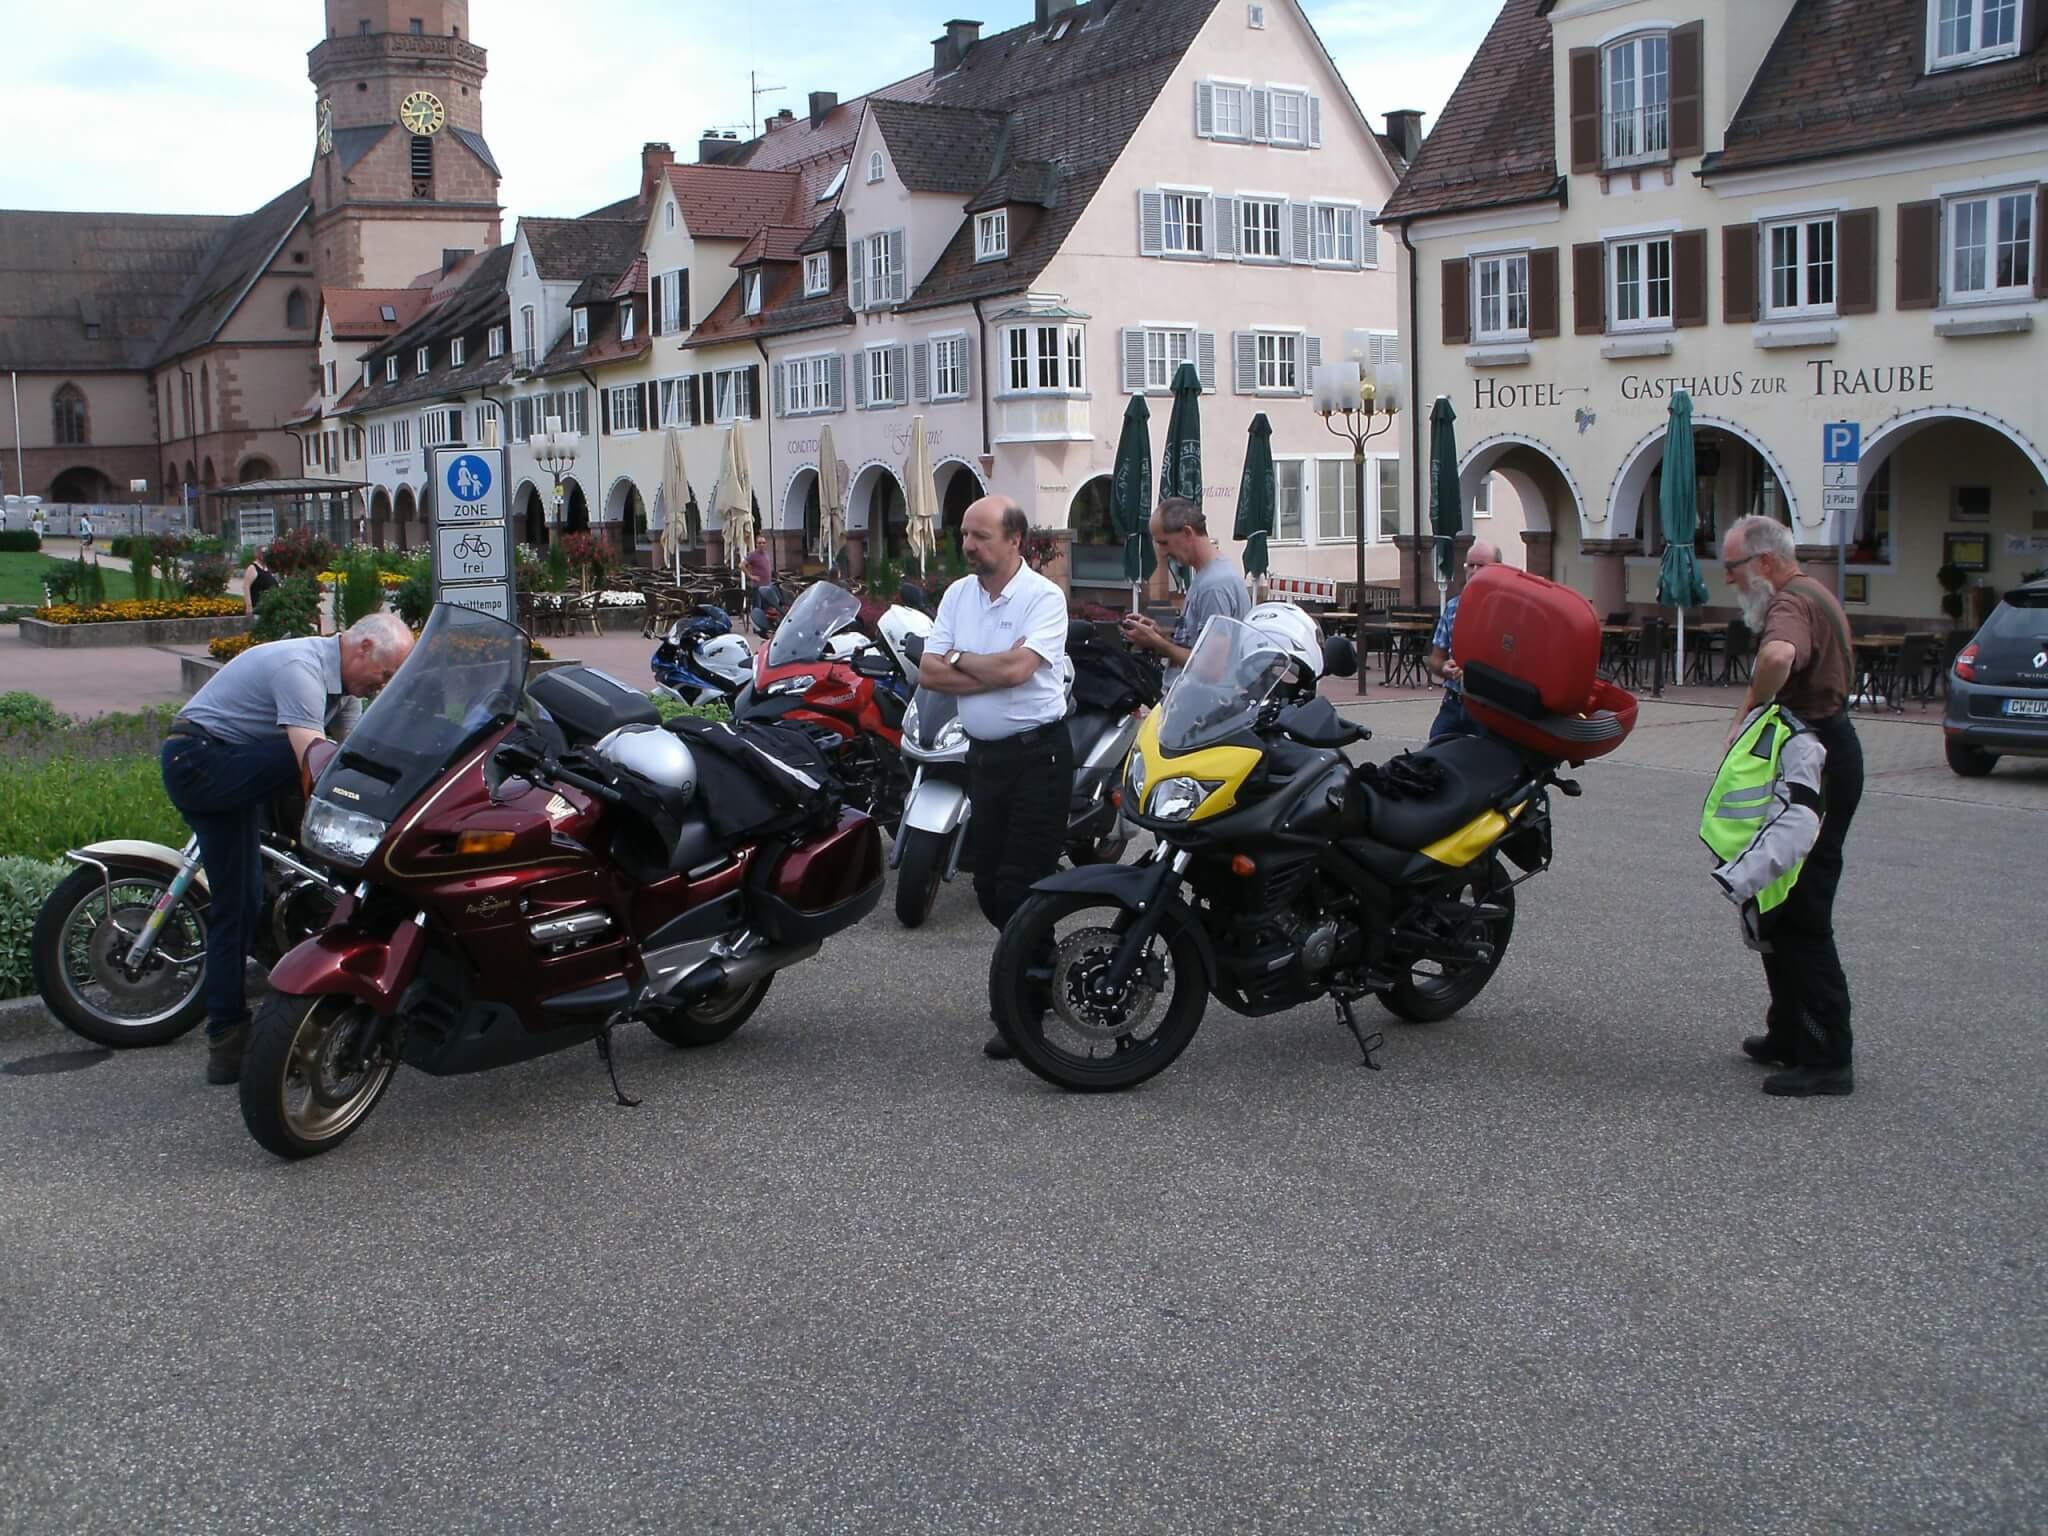 Motorradausfahrt – reine Männersache